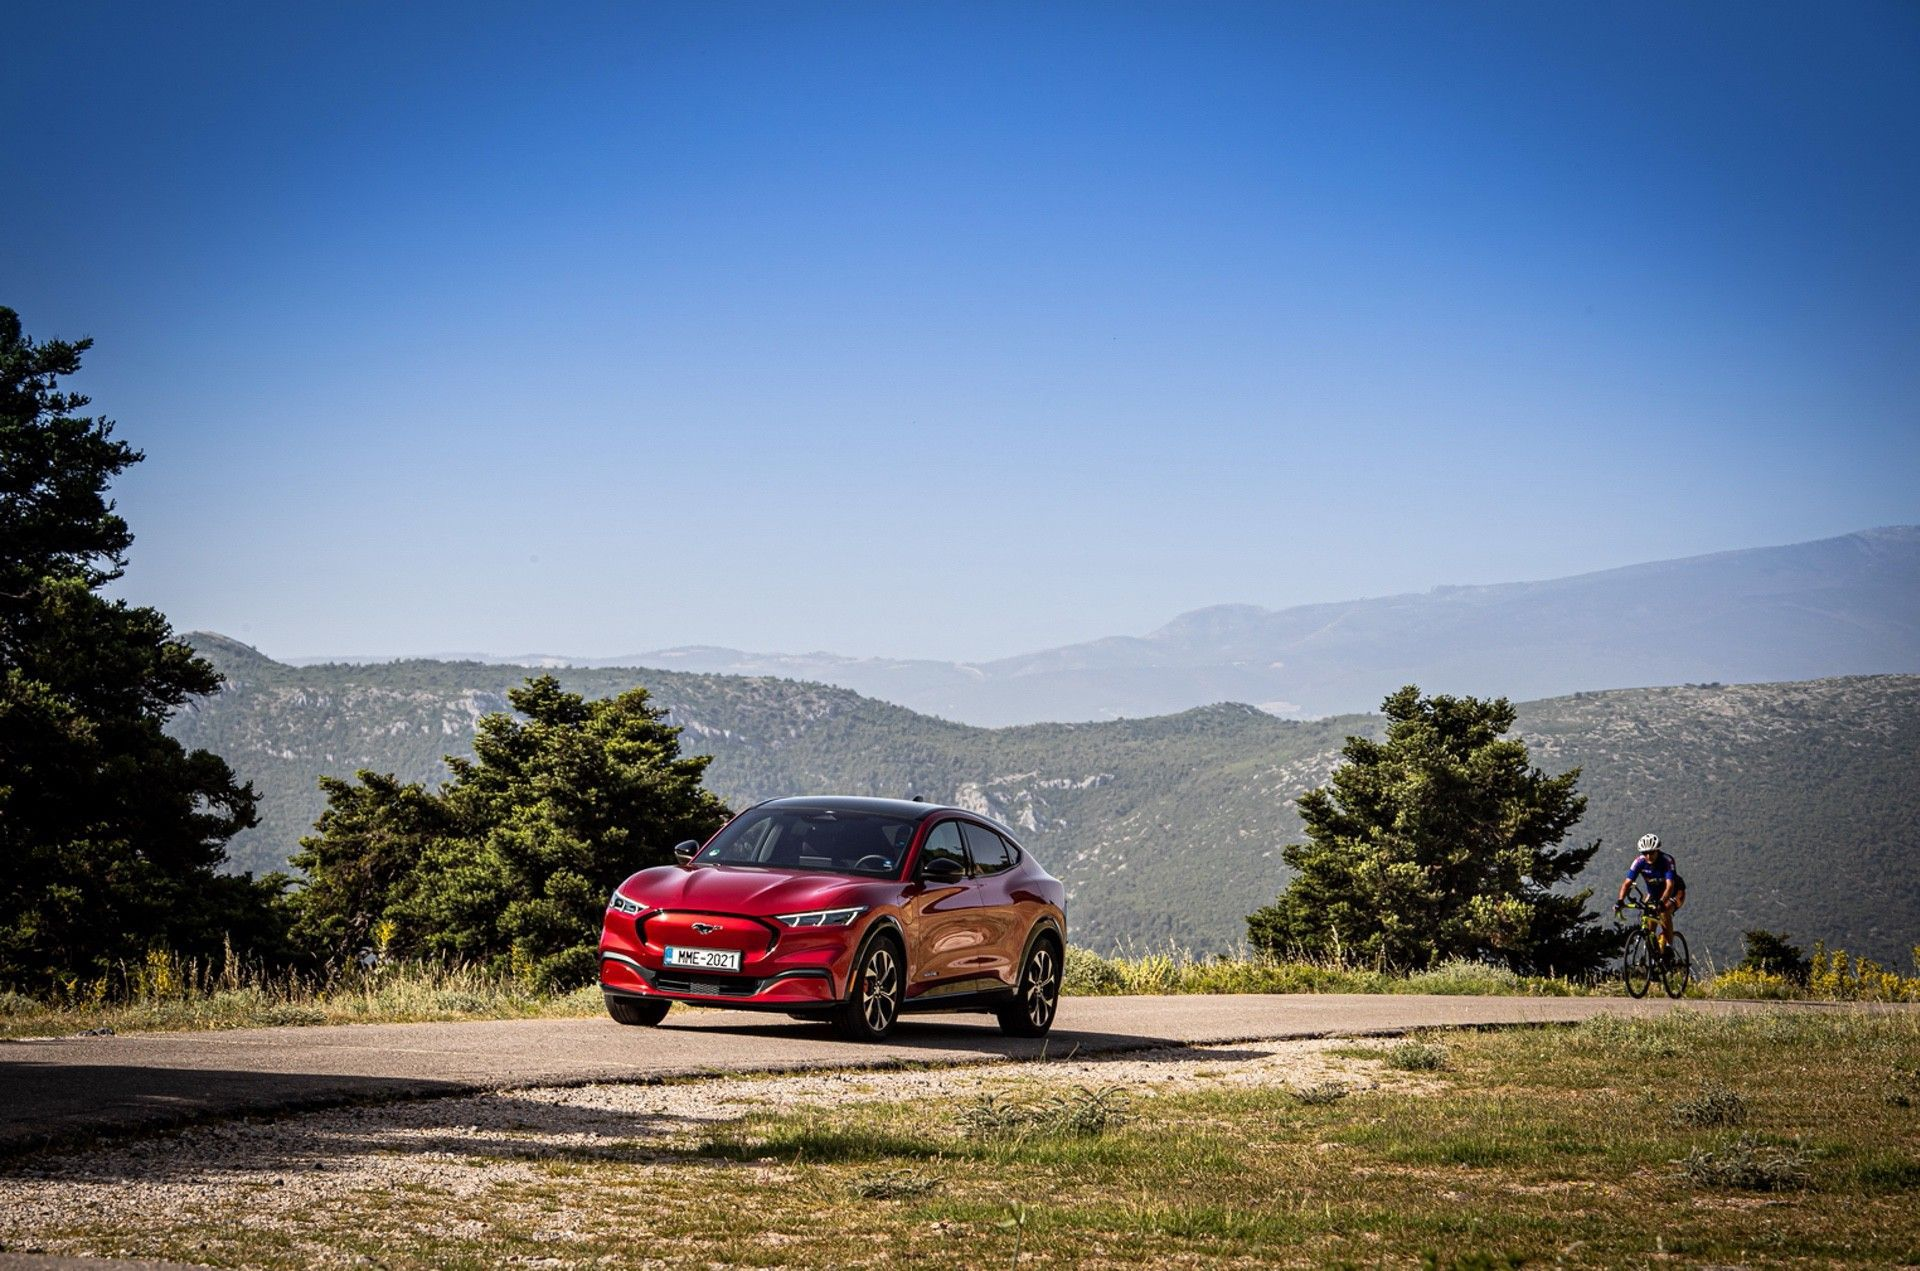 Ford_Mustang_Mach-E_greek_presskit-0143